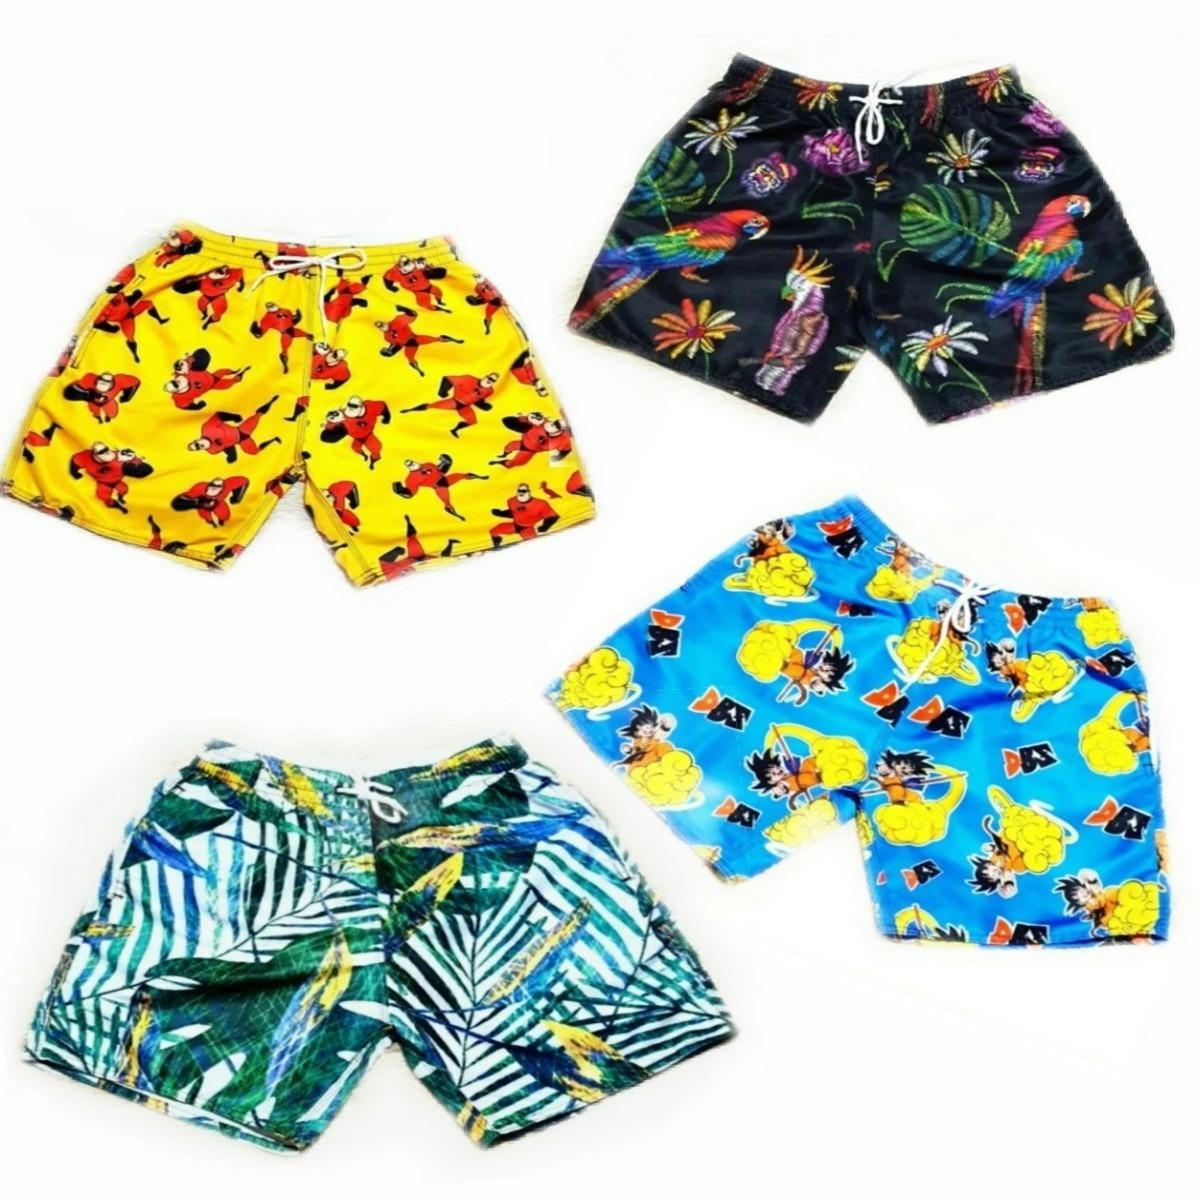 Kit 7 Shorts Mauricinho Bermudas Moda Praia Estilo Neymar